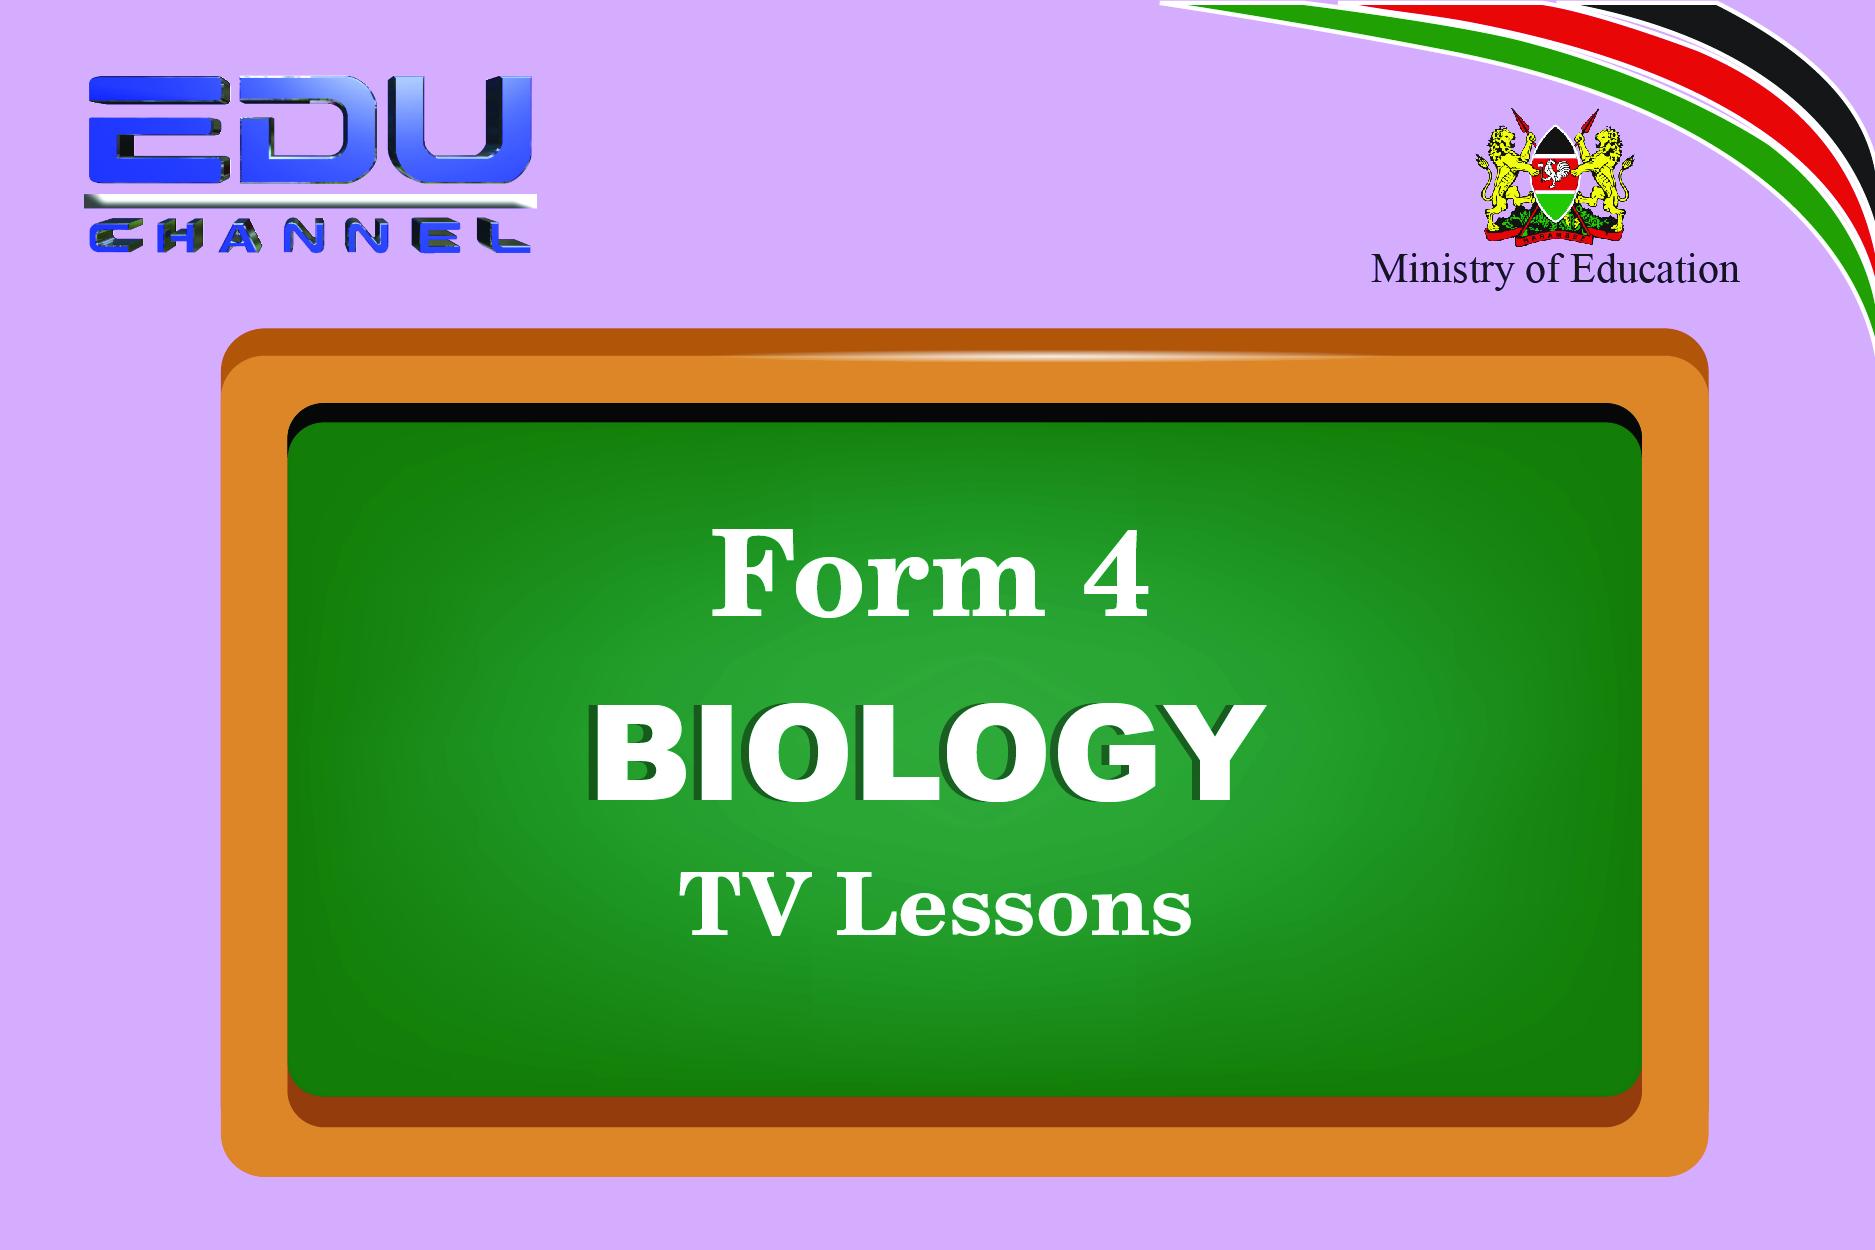 Form 4 Biology Lesson 1: Genetics Variations